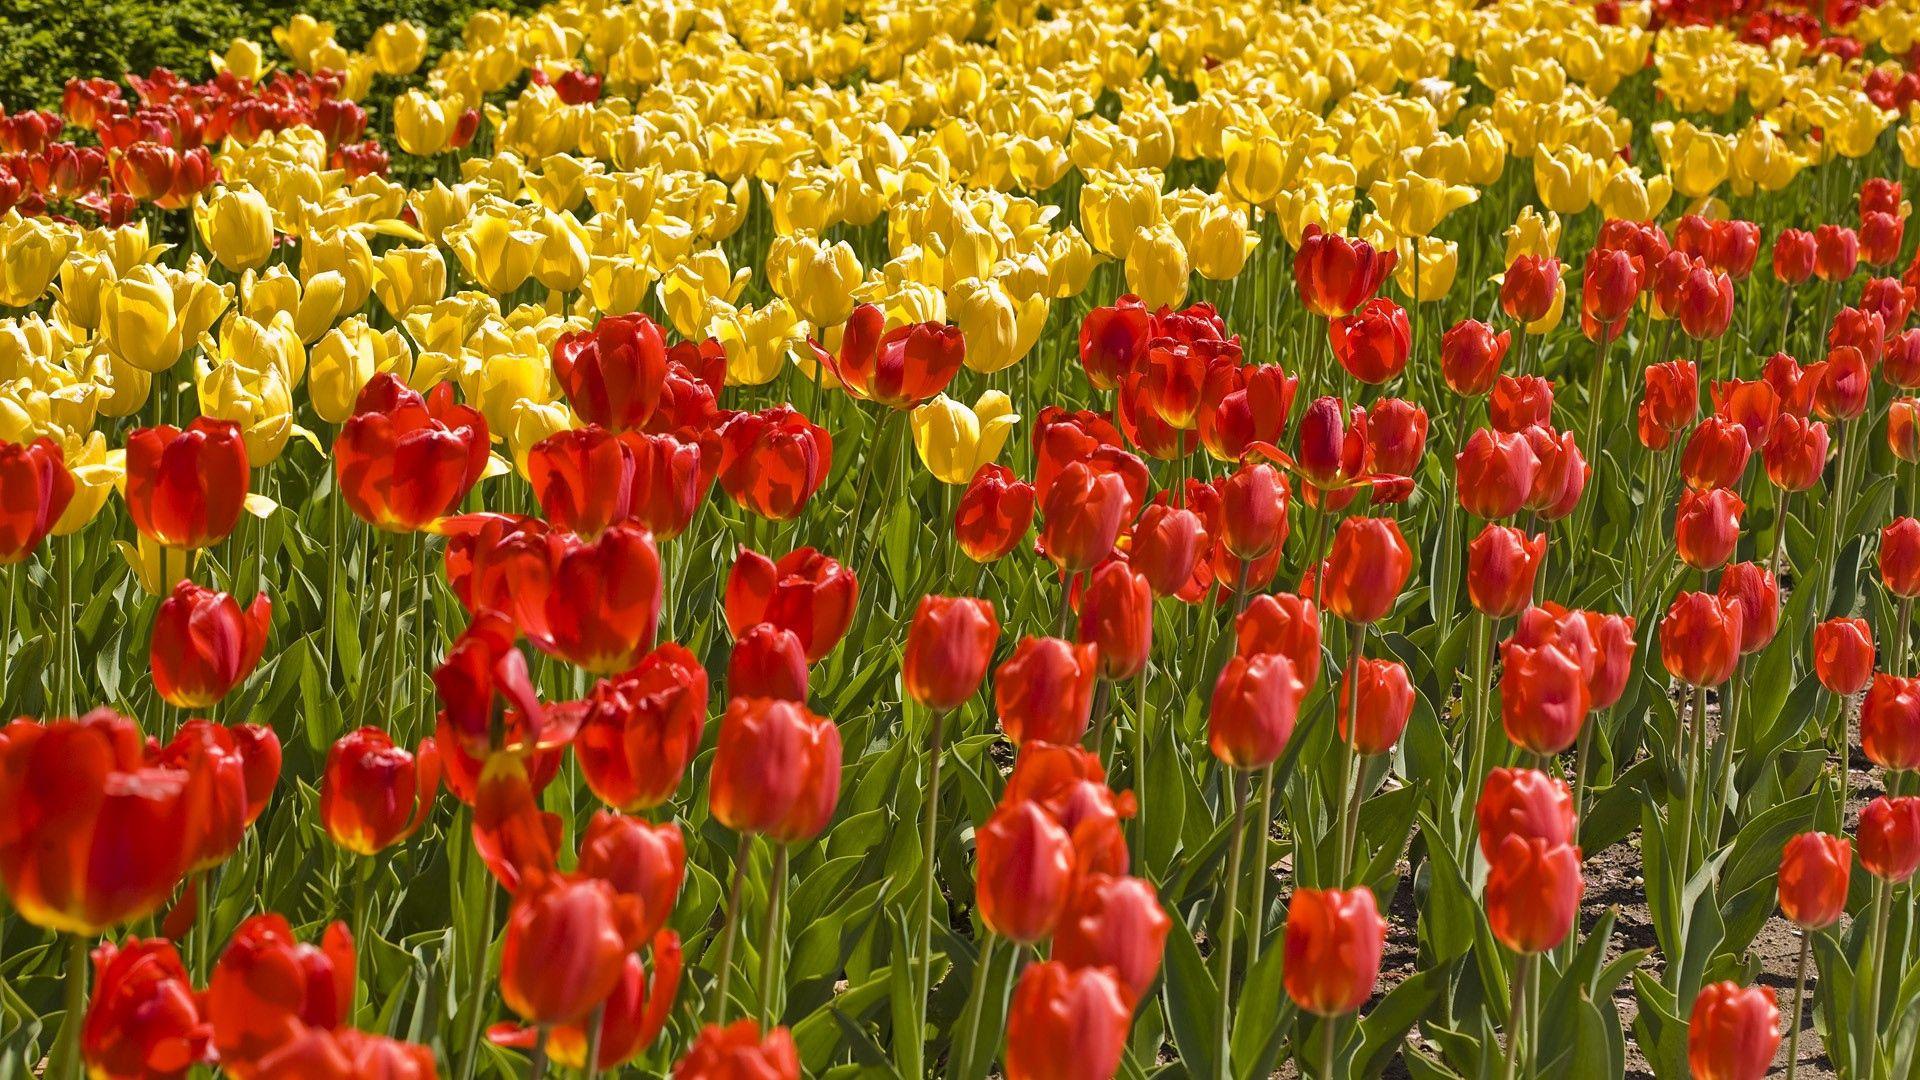 62069 descargar fondo de pantalla Flores, Campo, Hierba, Cama De Flores, Parterre, Tulipanes: protectores de pantalla e imágenes gratis